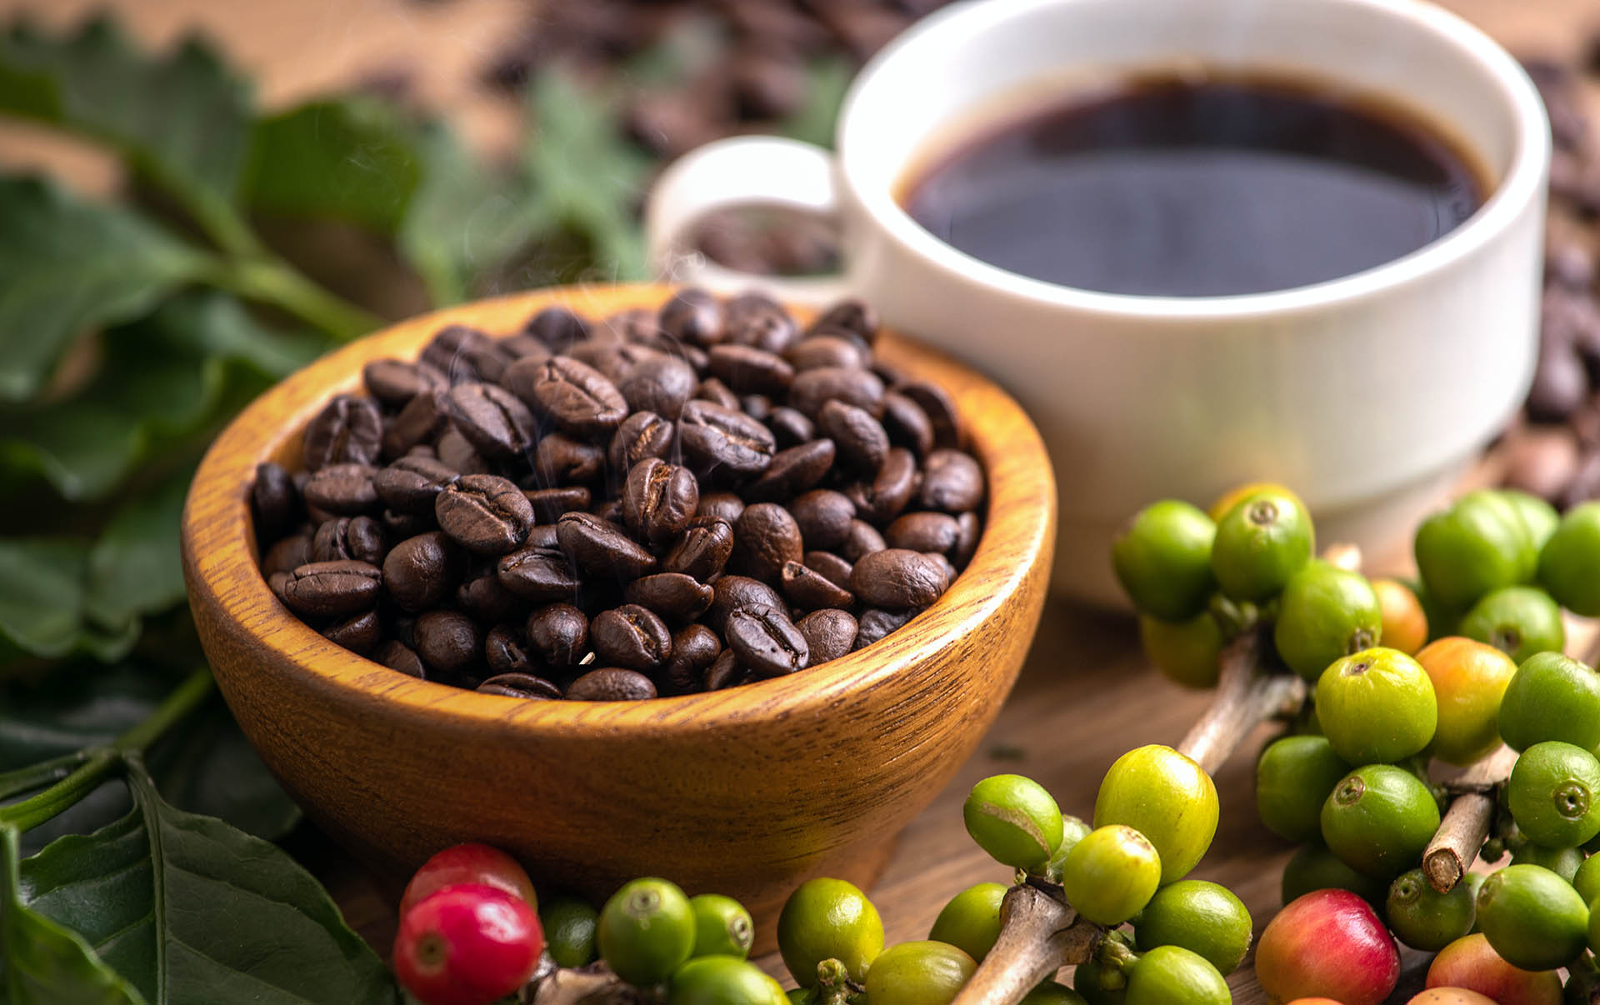 Cup Of Coffee Beans With Smoke Qud84Lb Kuban®